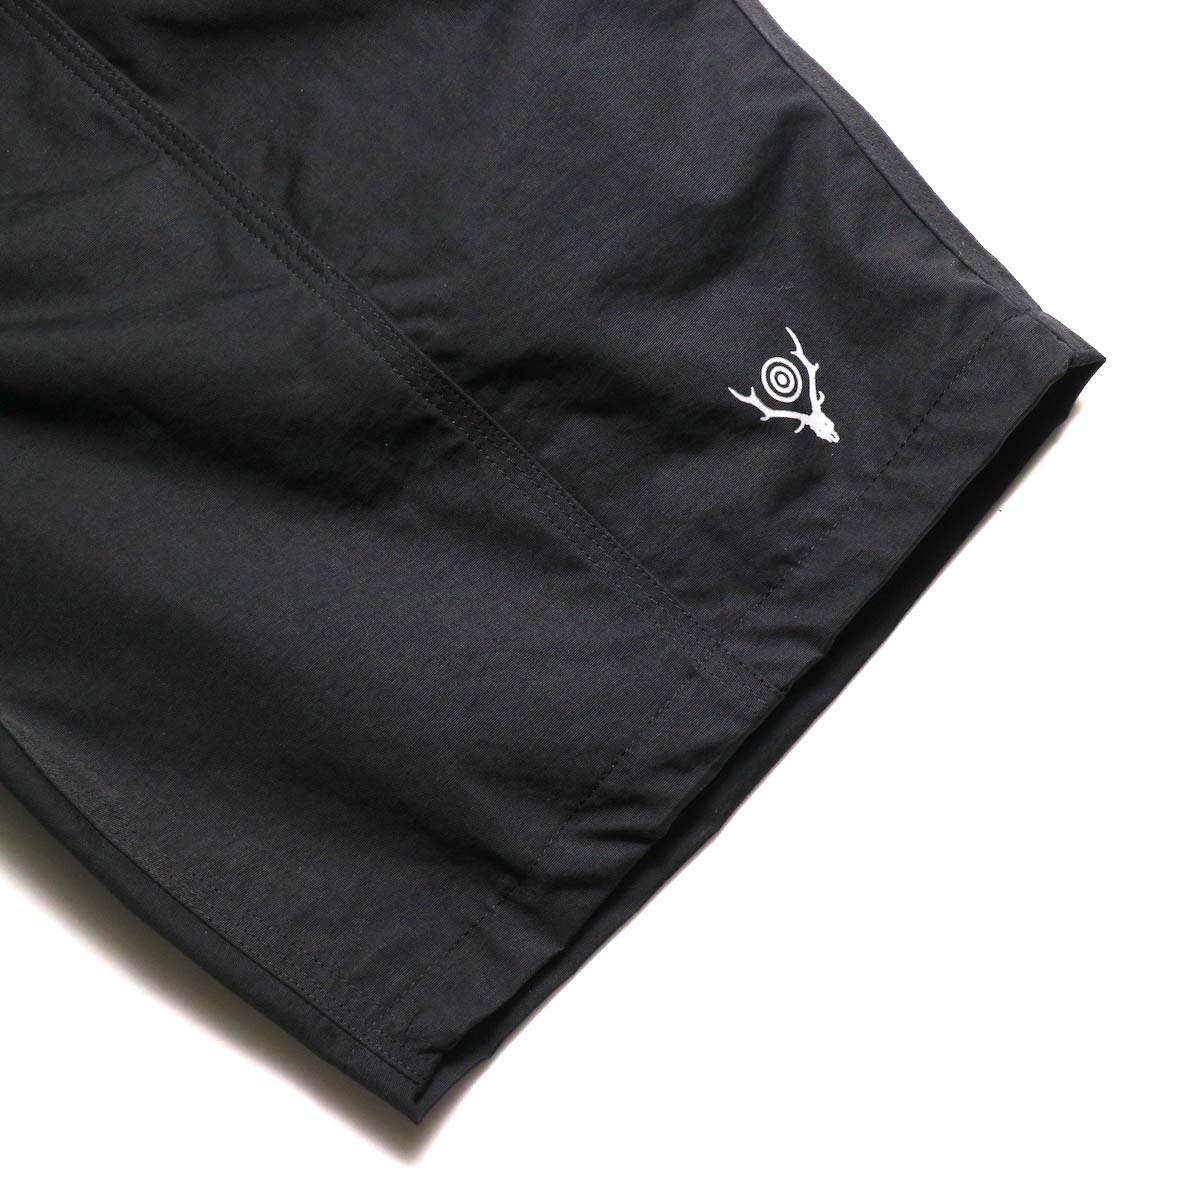 SOUTH2 WEST8 / Belted Center Seam Short -Nylon Tussore (Black) スソ